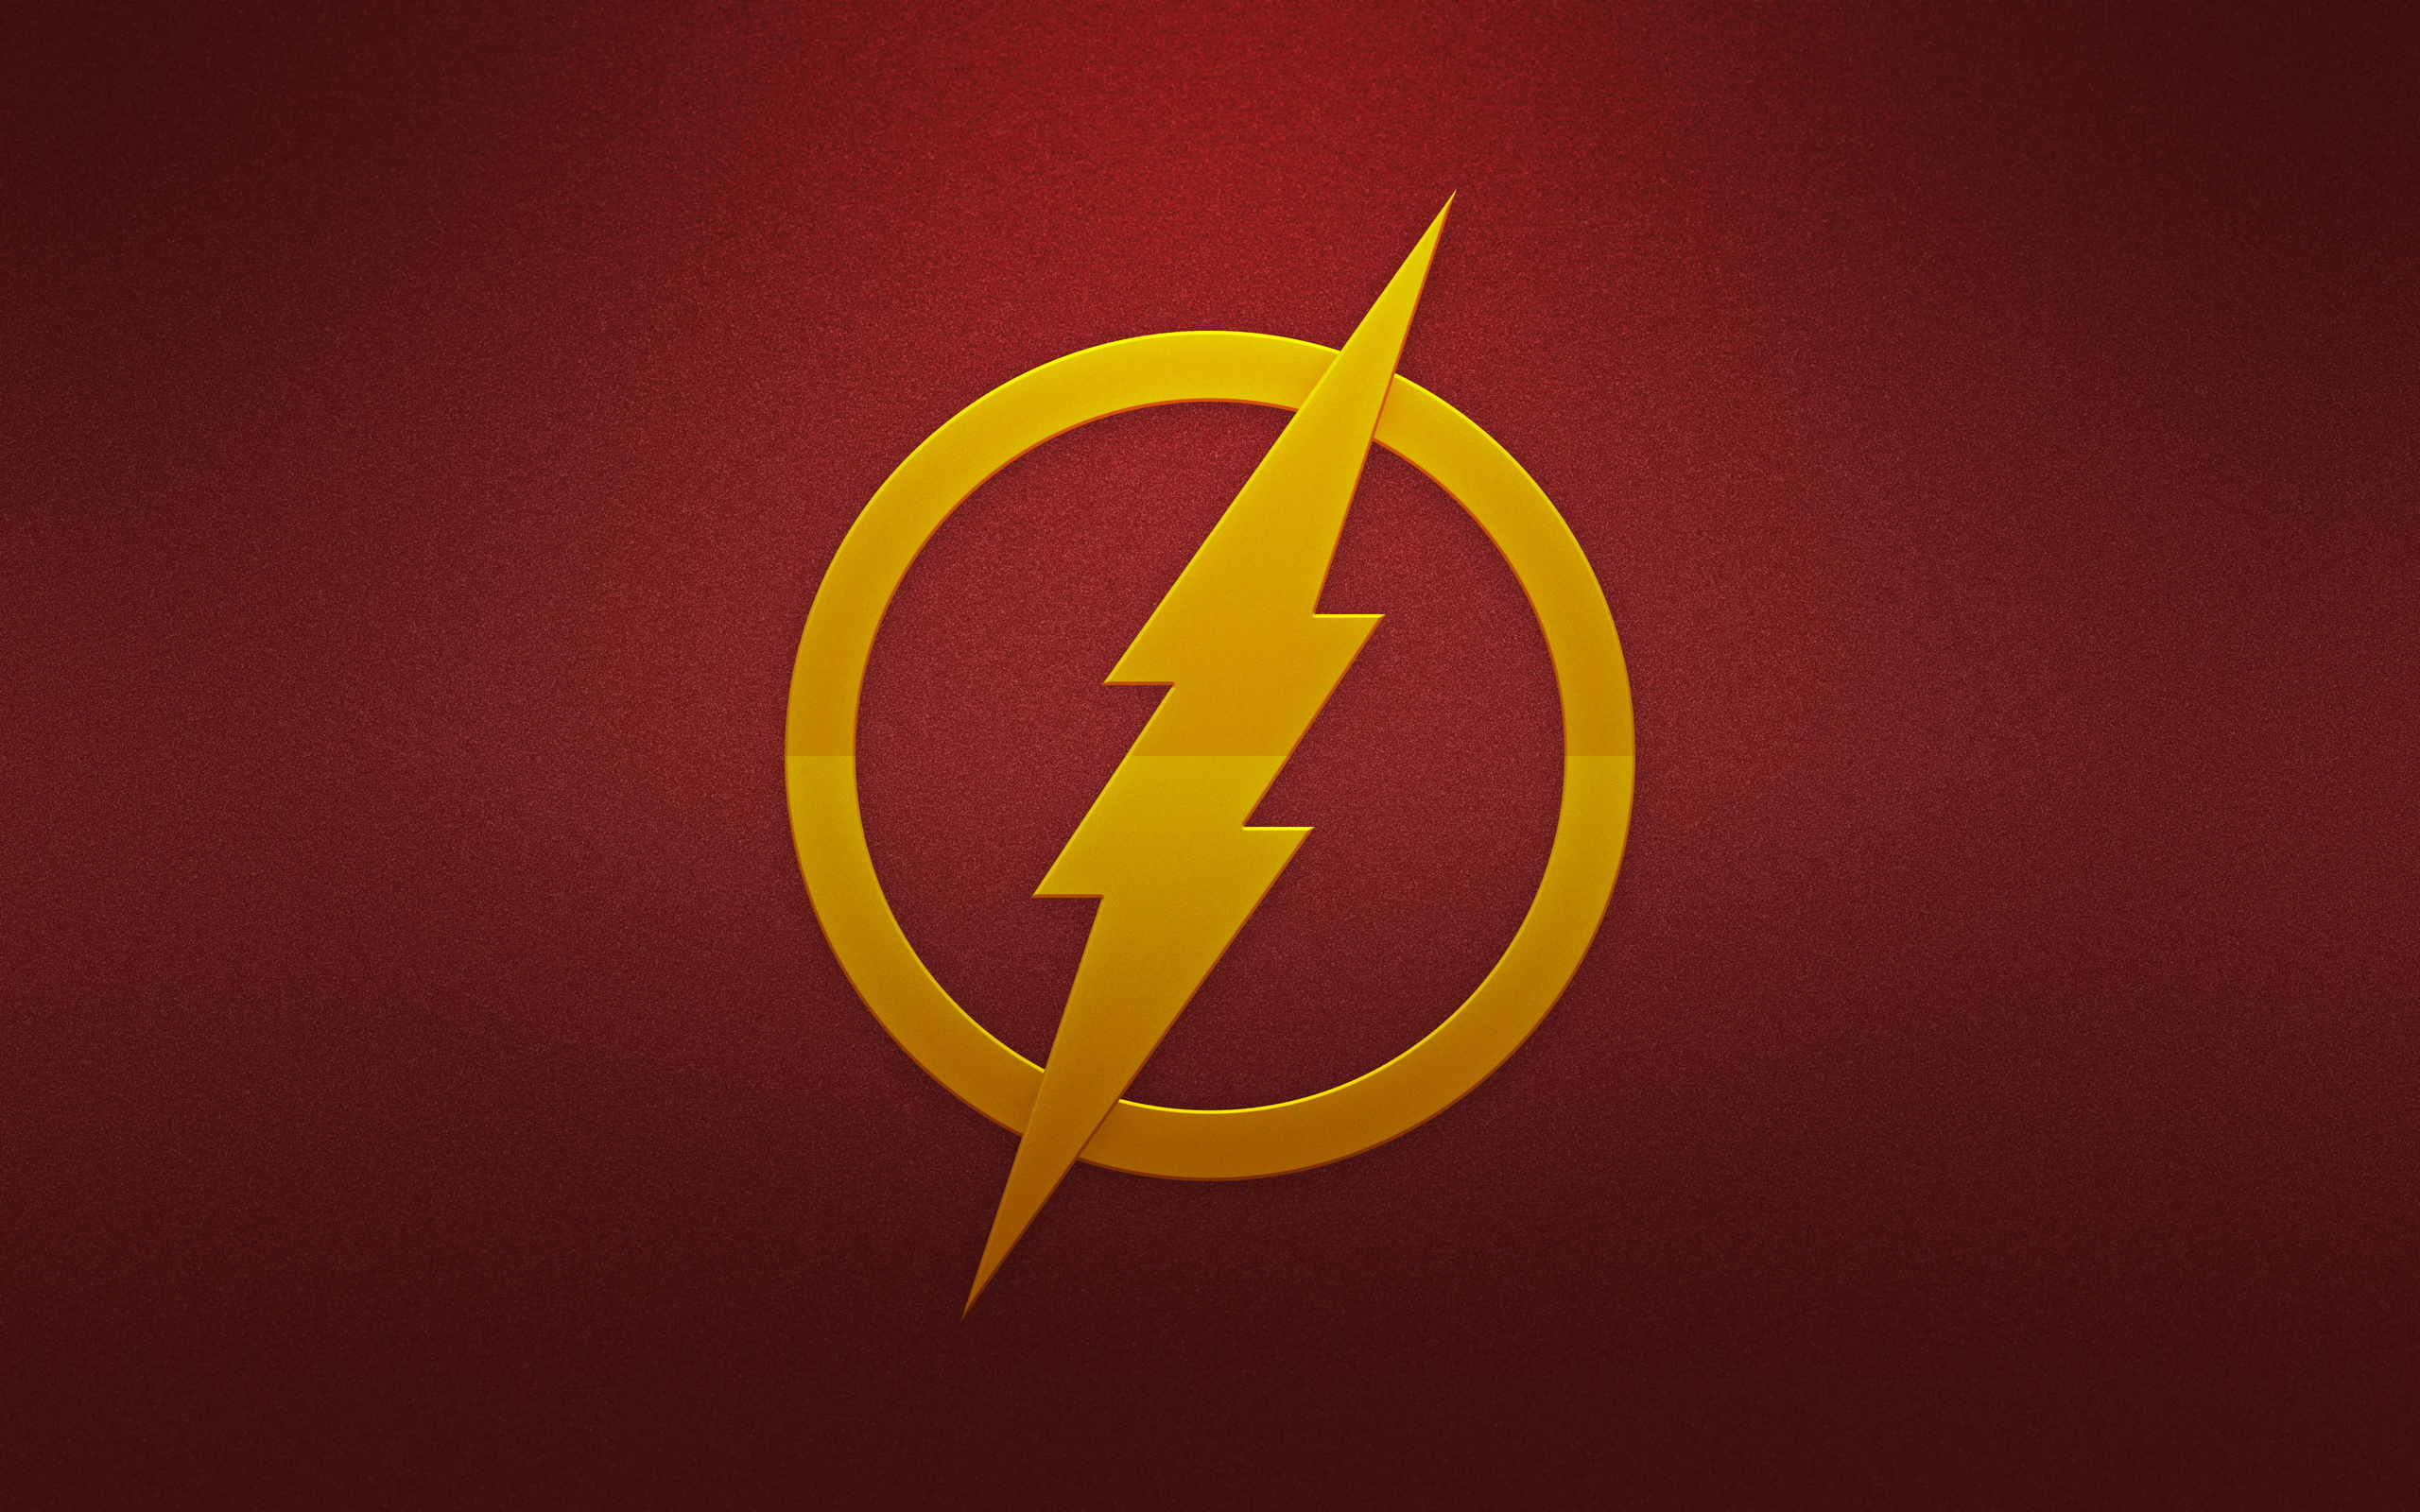 The Flash wallpaper 7